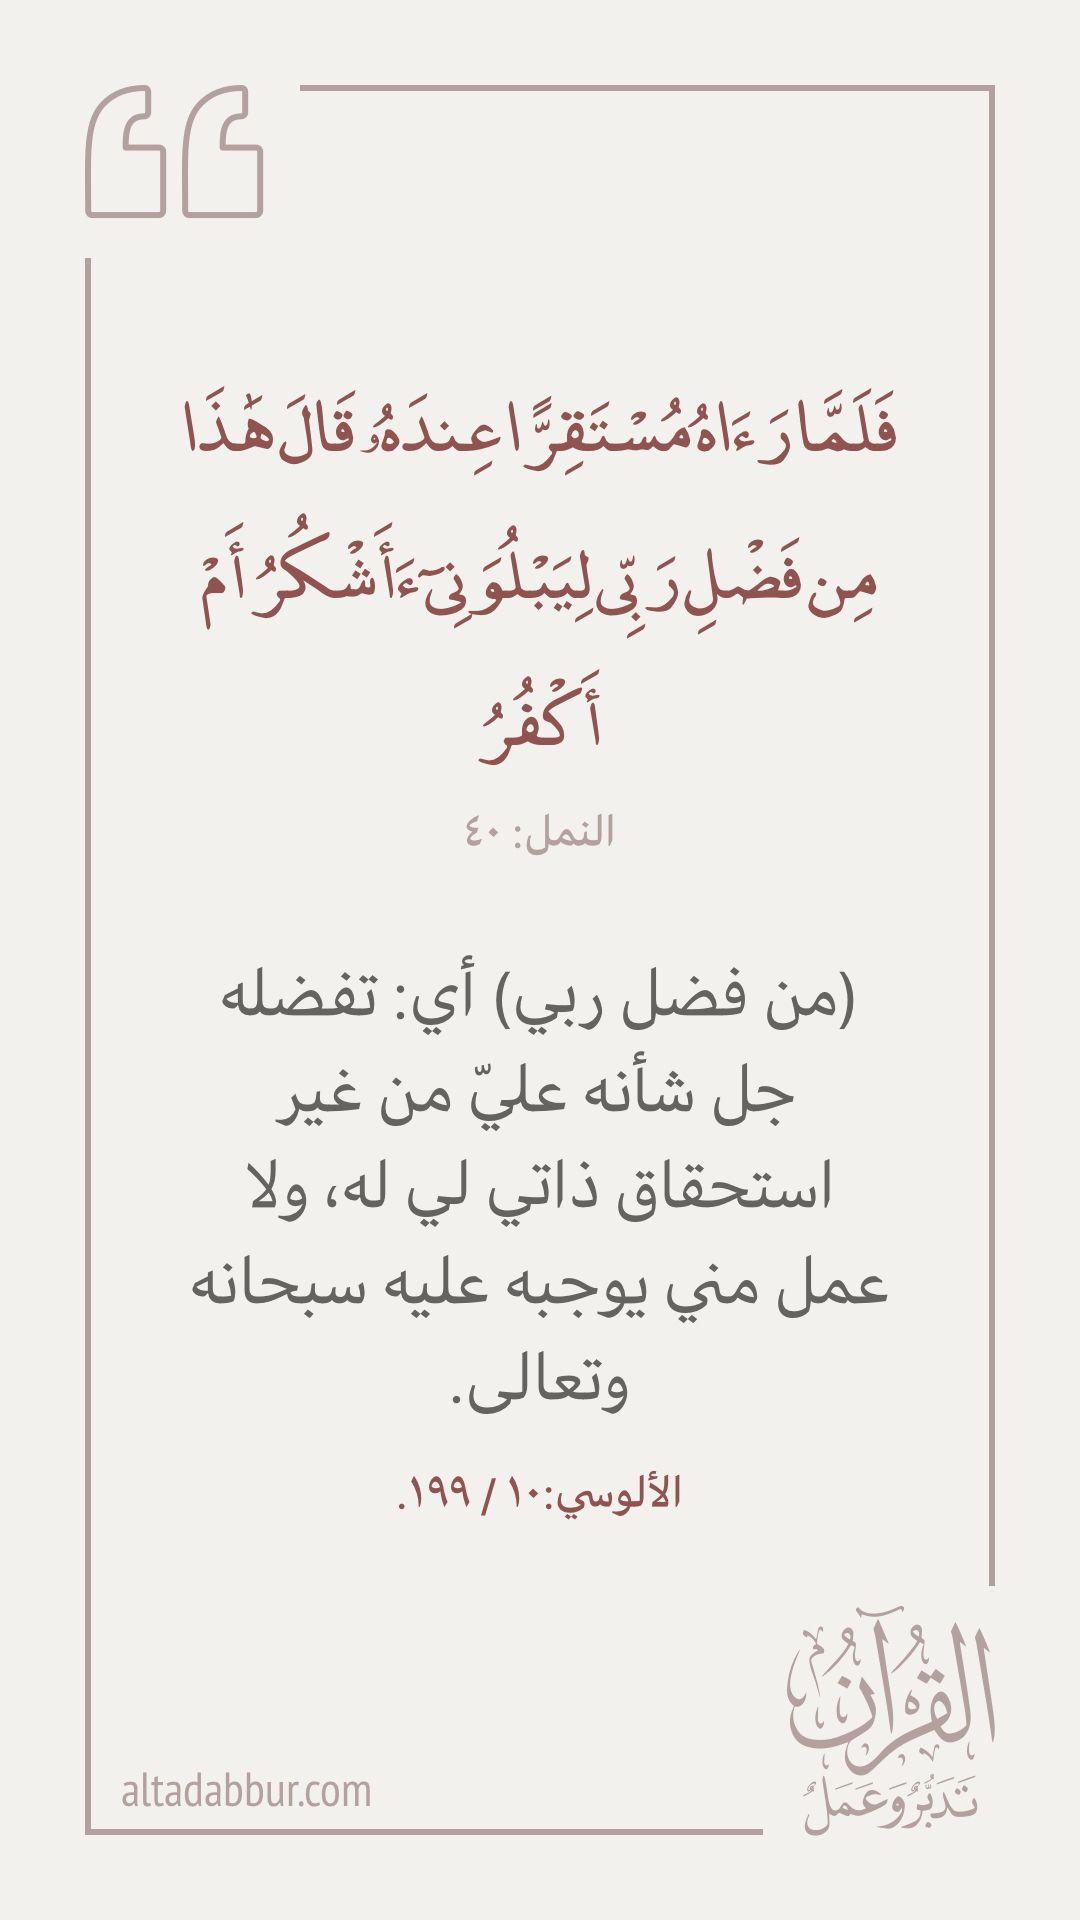 Pin By On قرآن تفسير وتدب ر Short Quotes Love Islamic Phrases Quran Verses